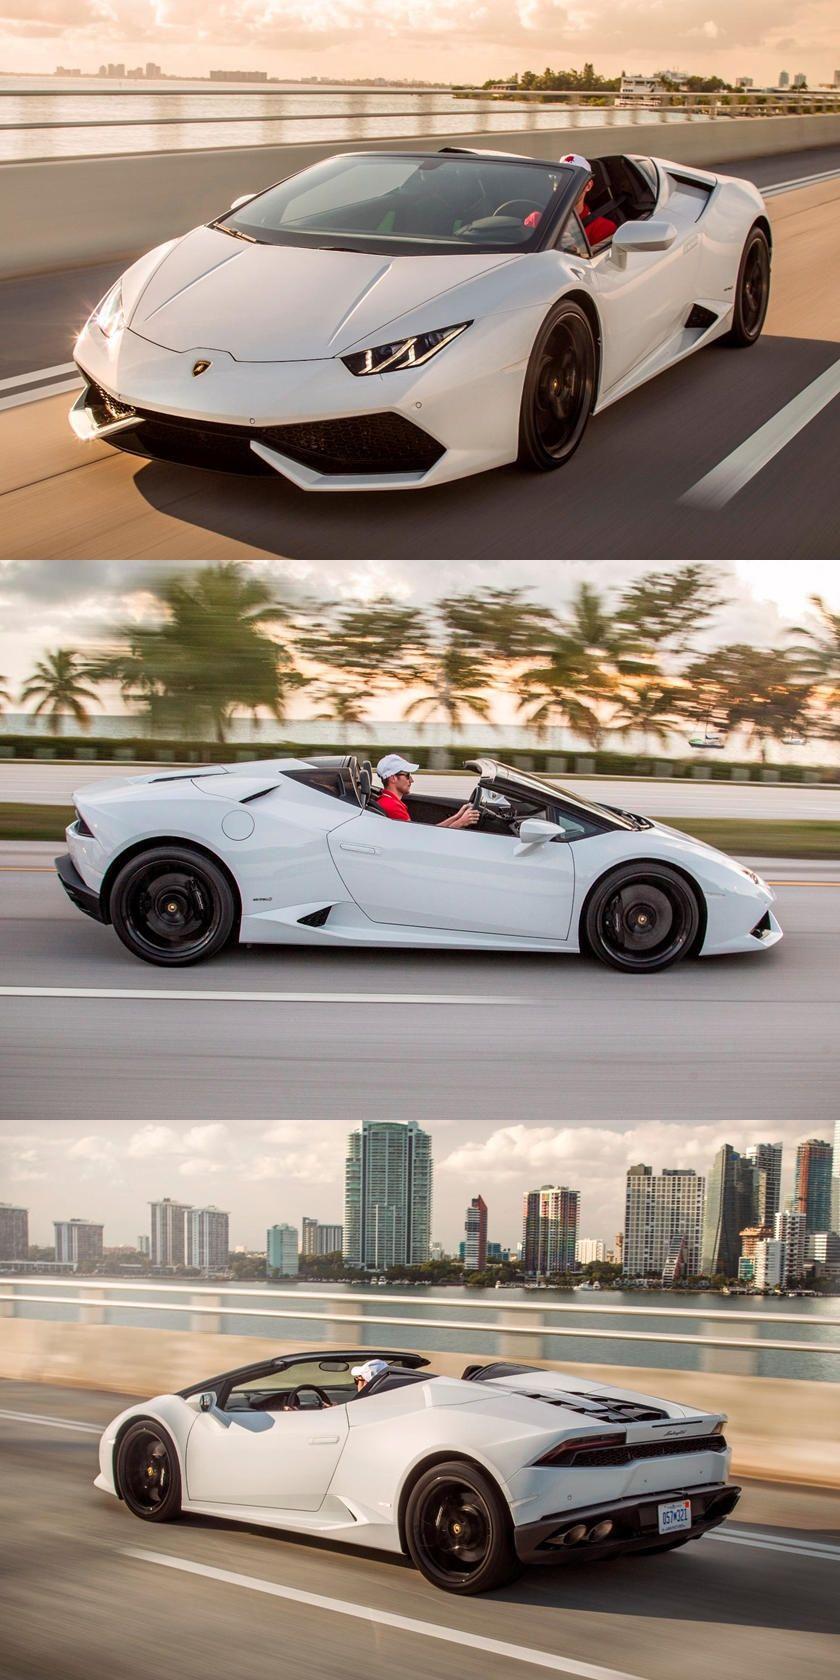 Lamborghini Dealership Sued Because Huracan Changed Colors You Read That Right In 2020 Lamborghini Dealership Lamborghini Dealership